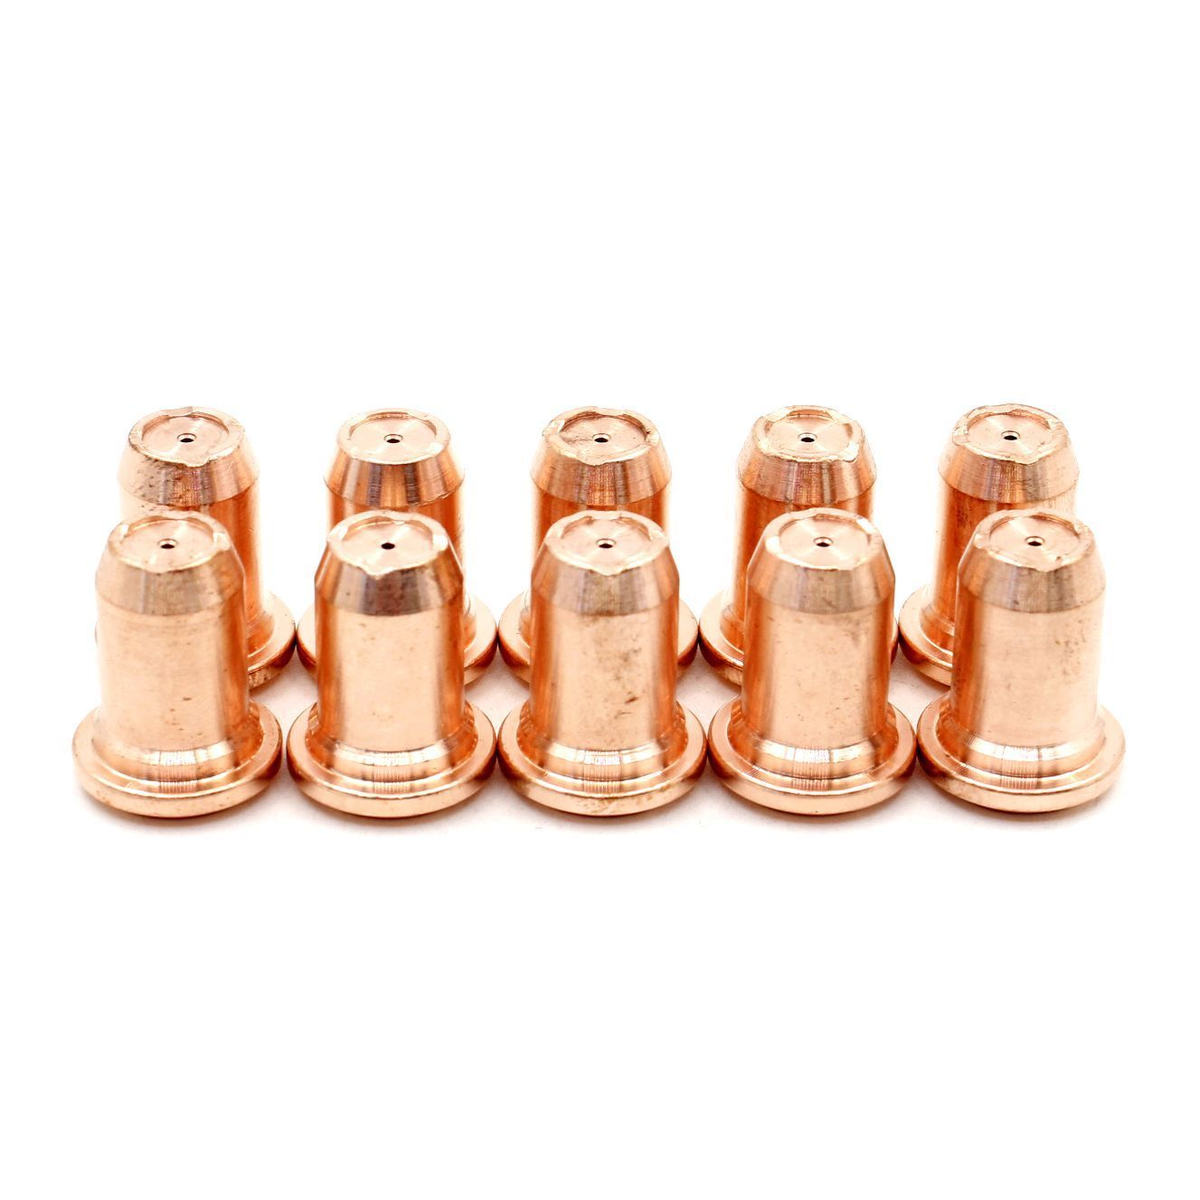 10pcs Plasma Torch 0.9mm 0.035'' Tips Nozzle 51312 For PT-60 PT-40 IPT60 IPT-60